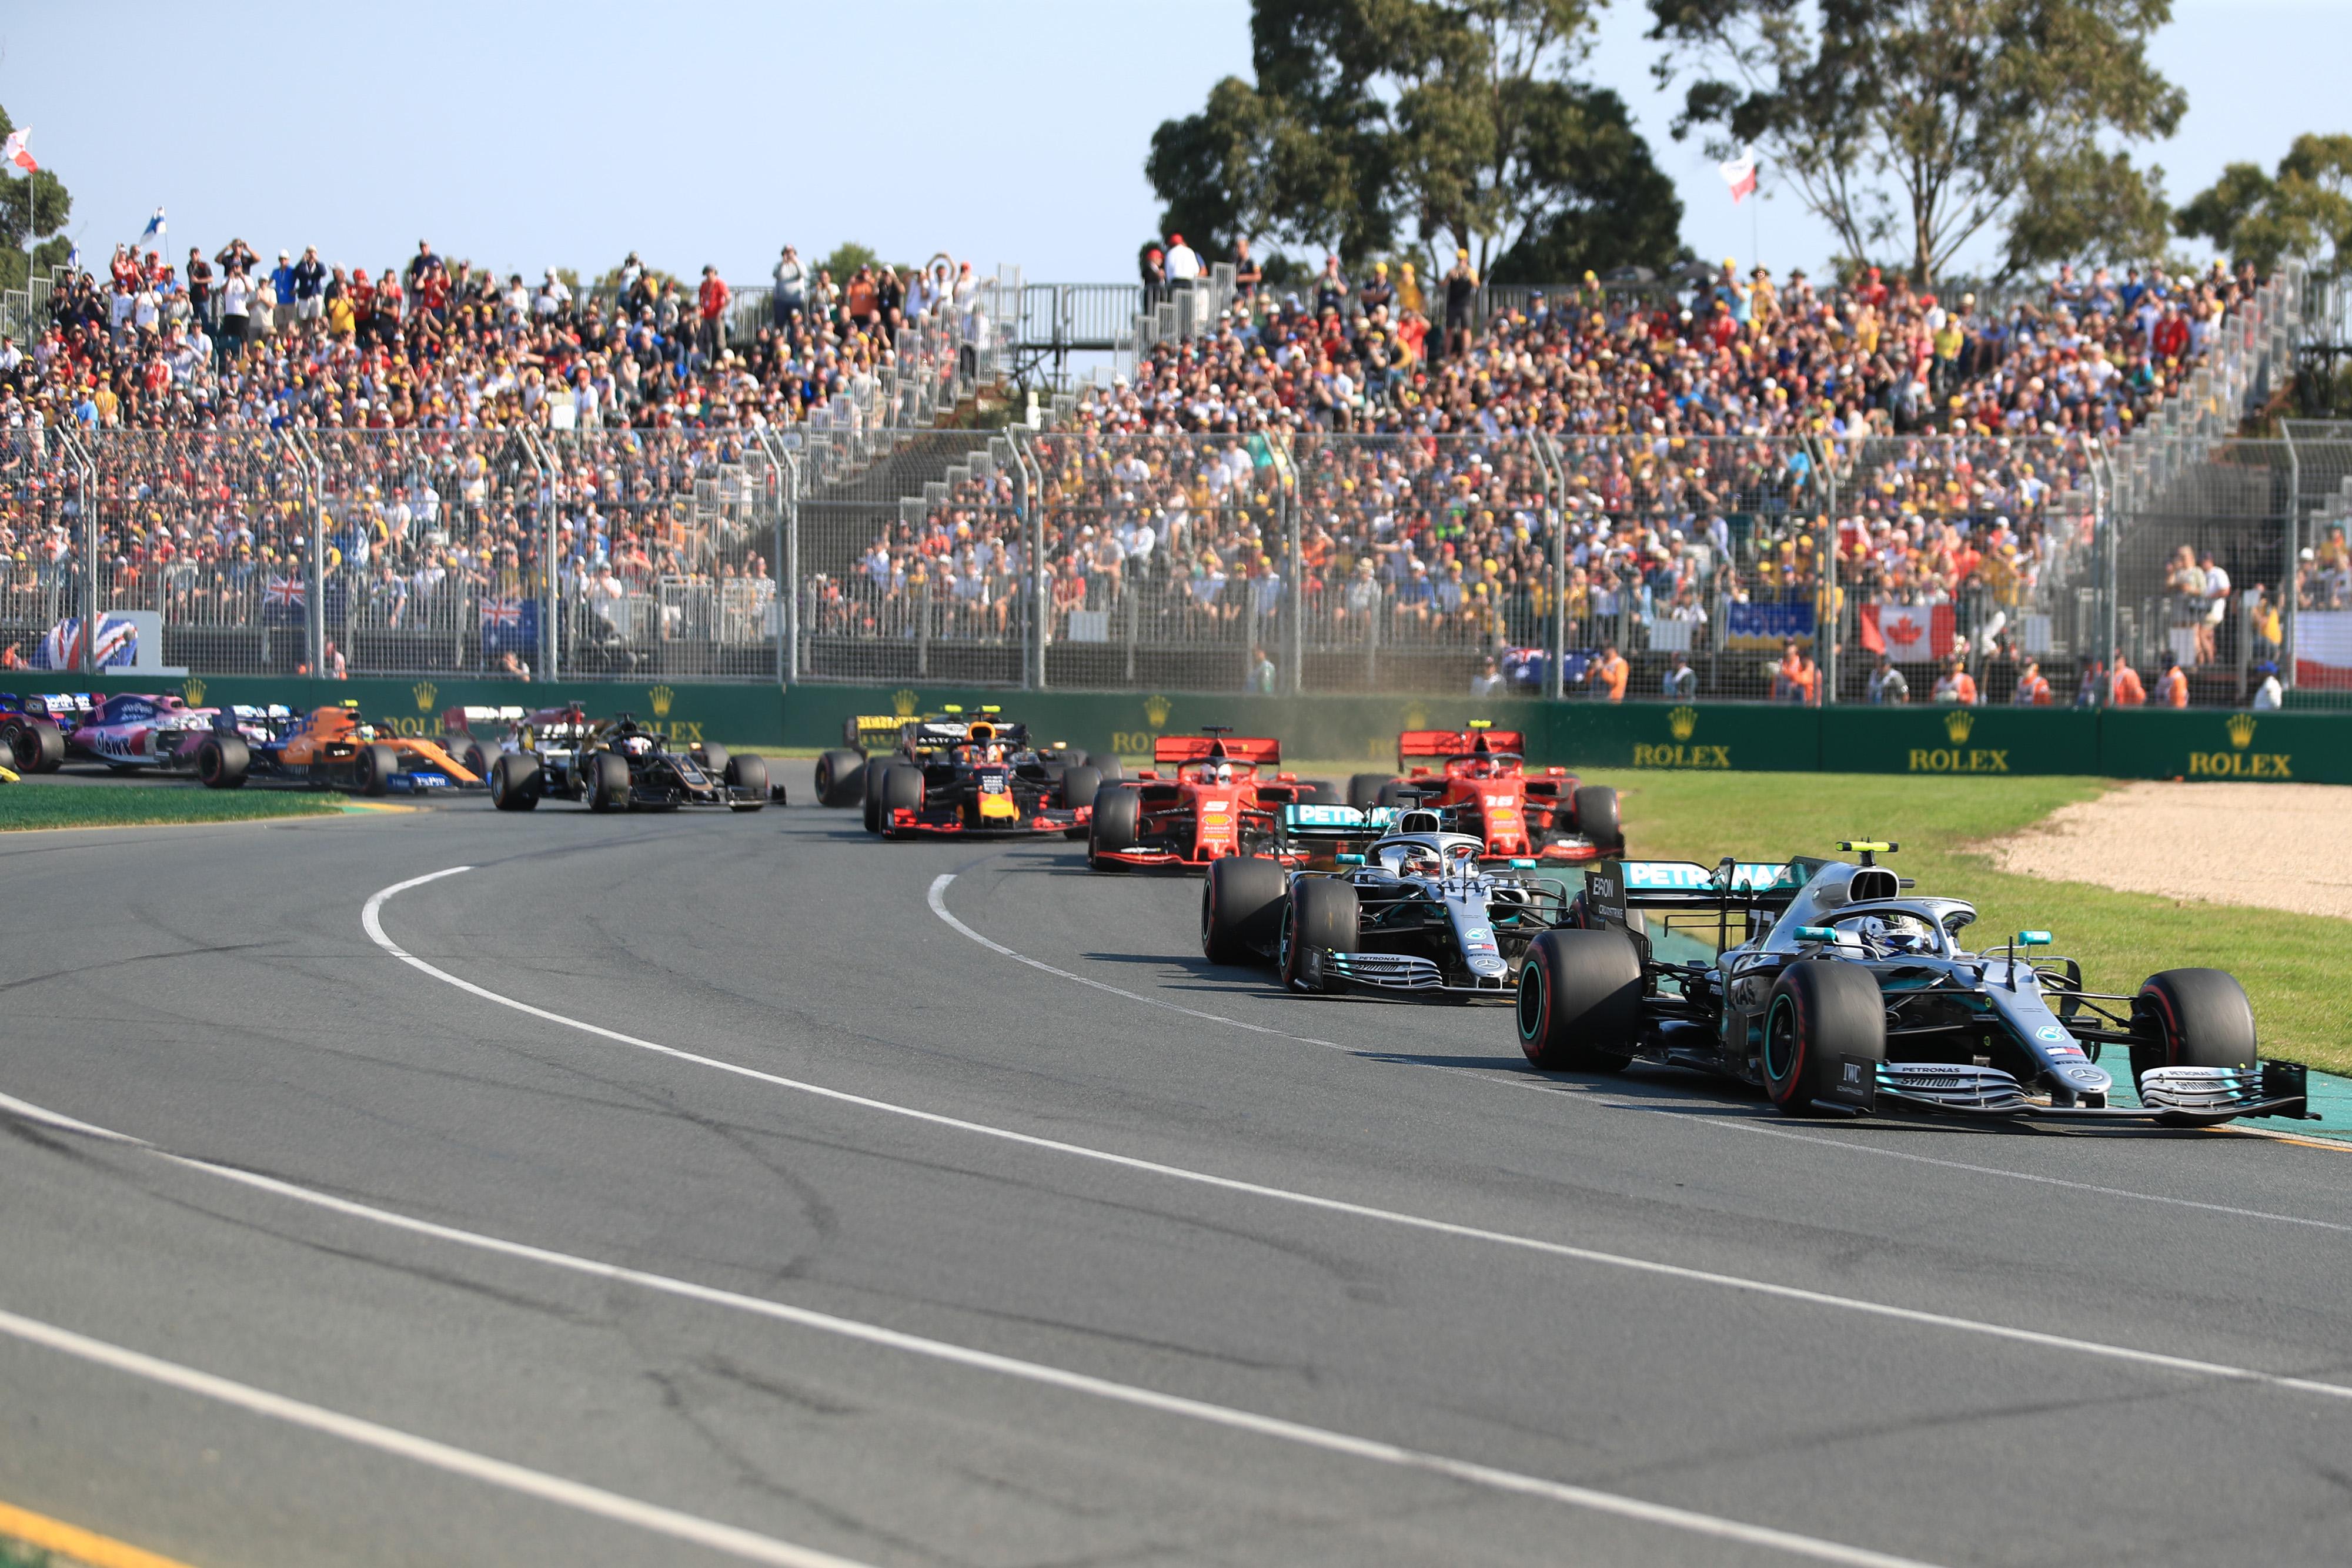 F1 Formula 1 Australian Grand Prix auction